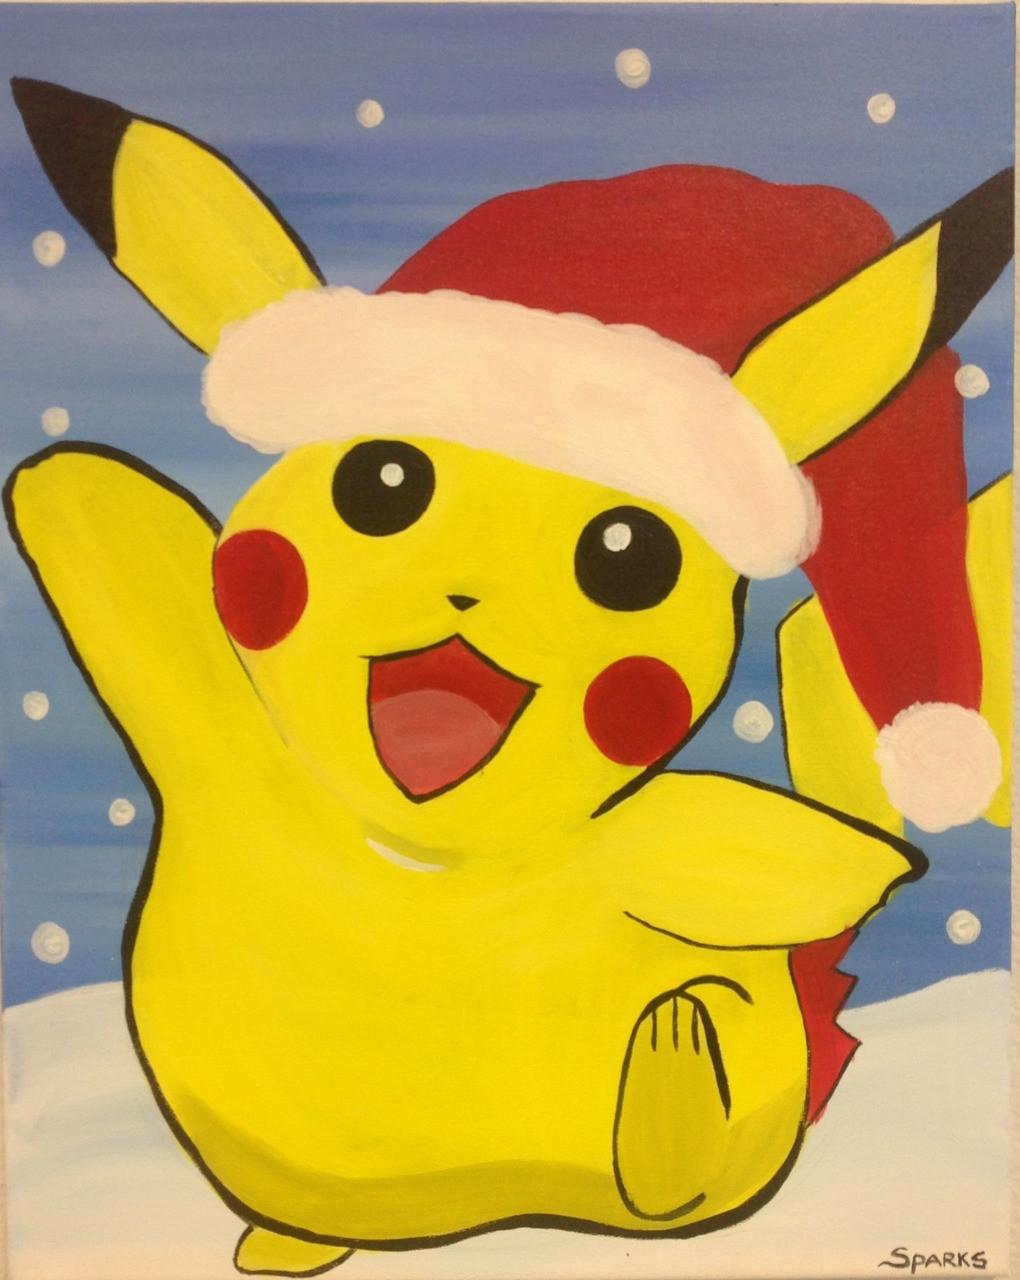 Christmas Pikachu.Sparks Art For Kids Christmas Pikachu